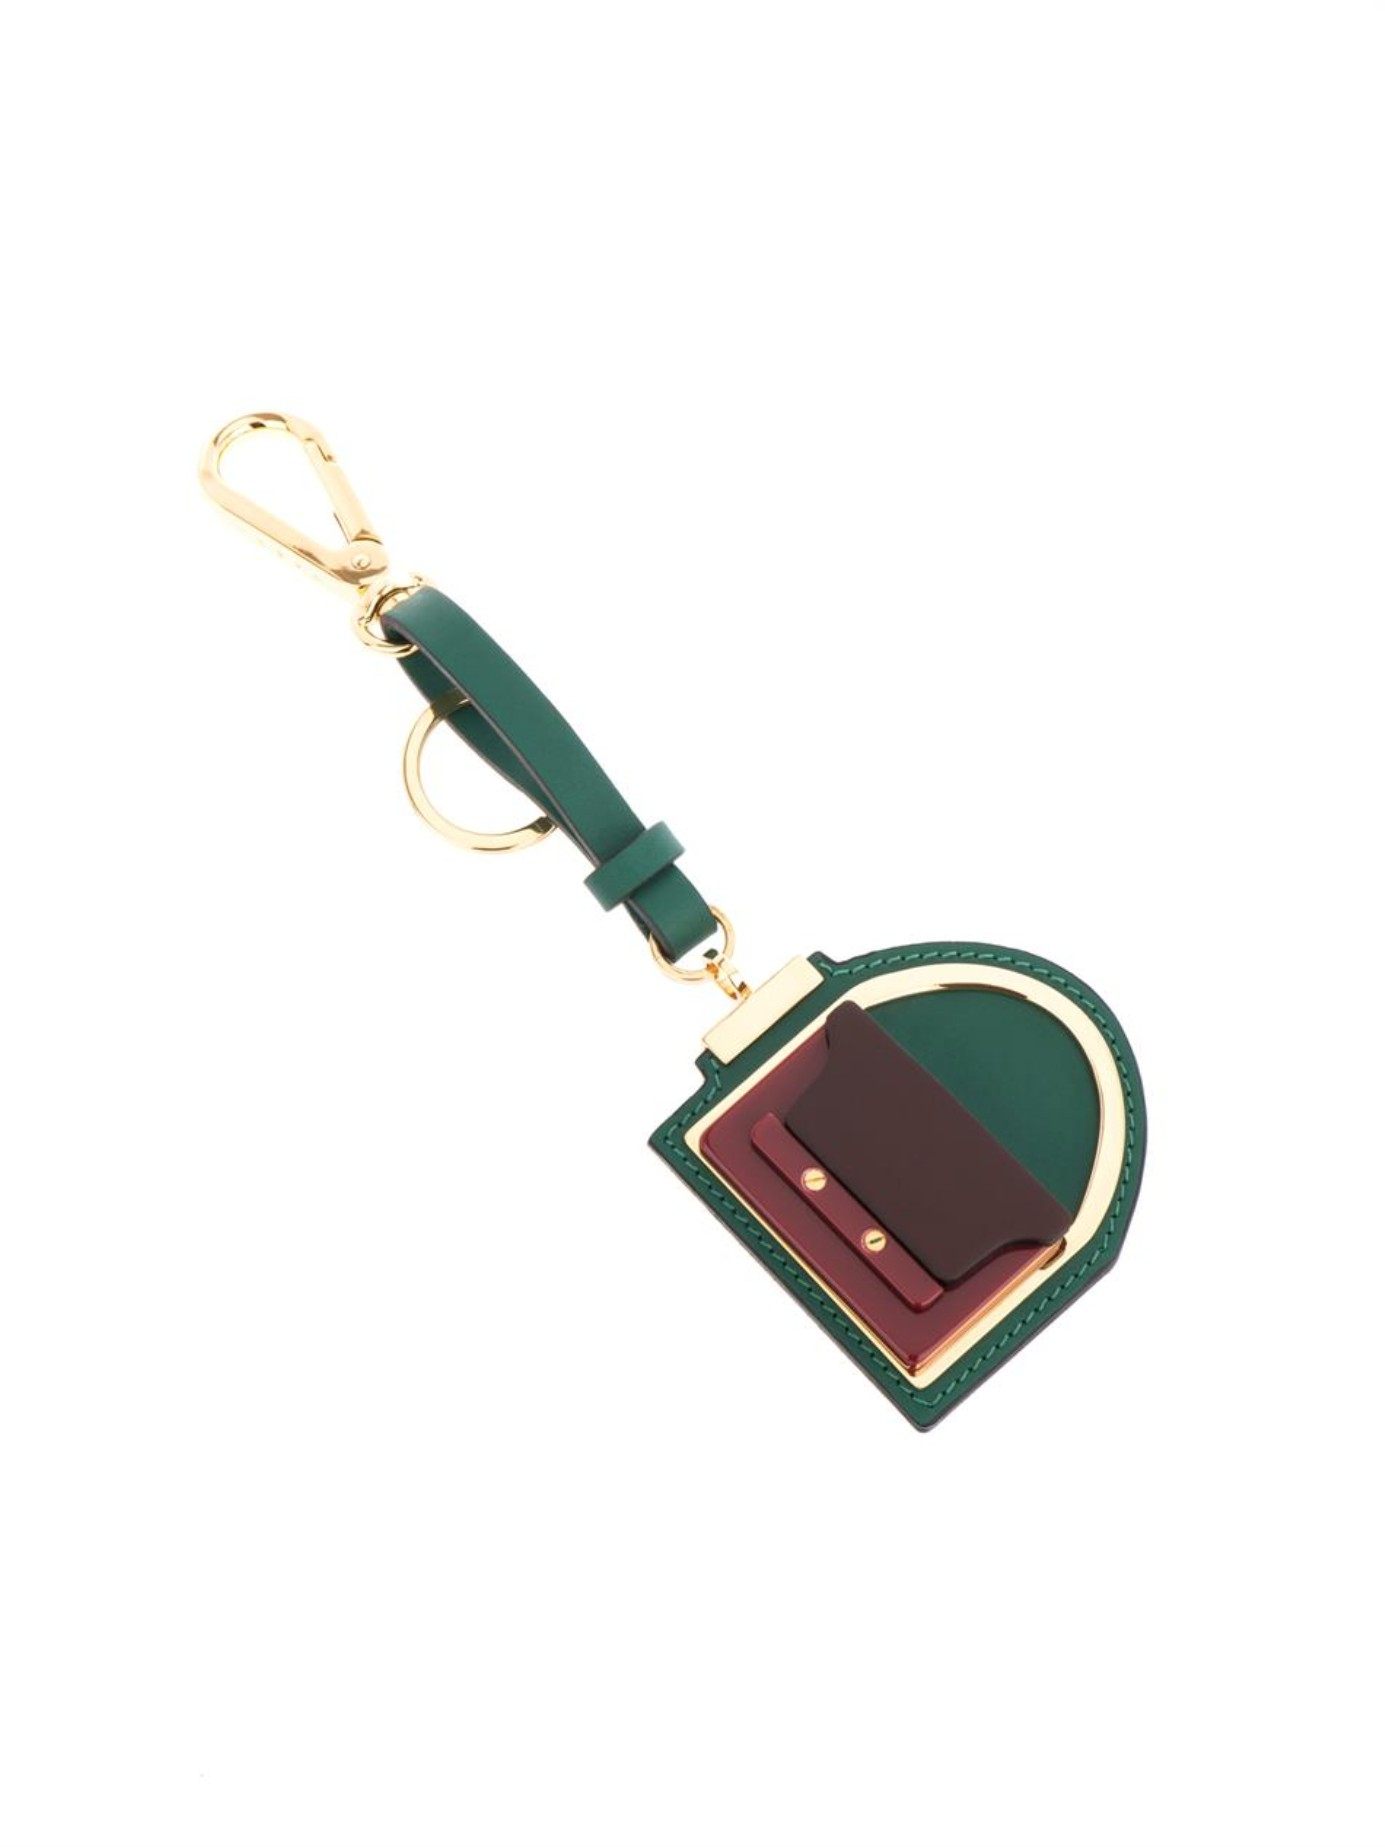 Marni Trunk key ring - Green 5ck2ZScY97